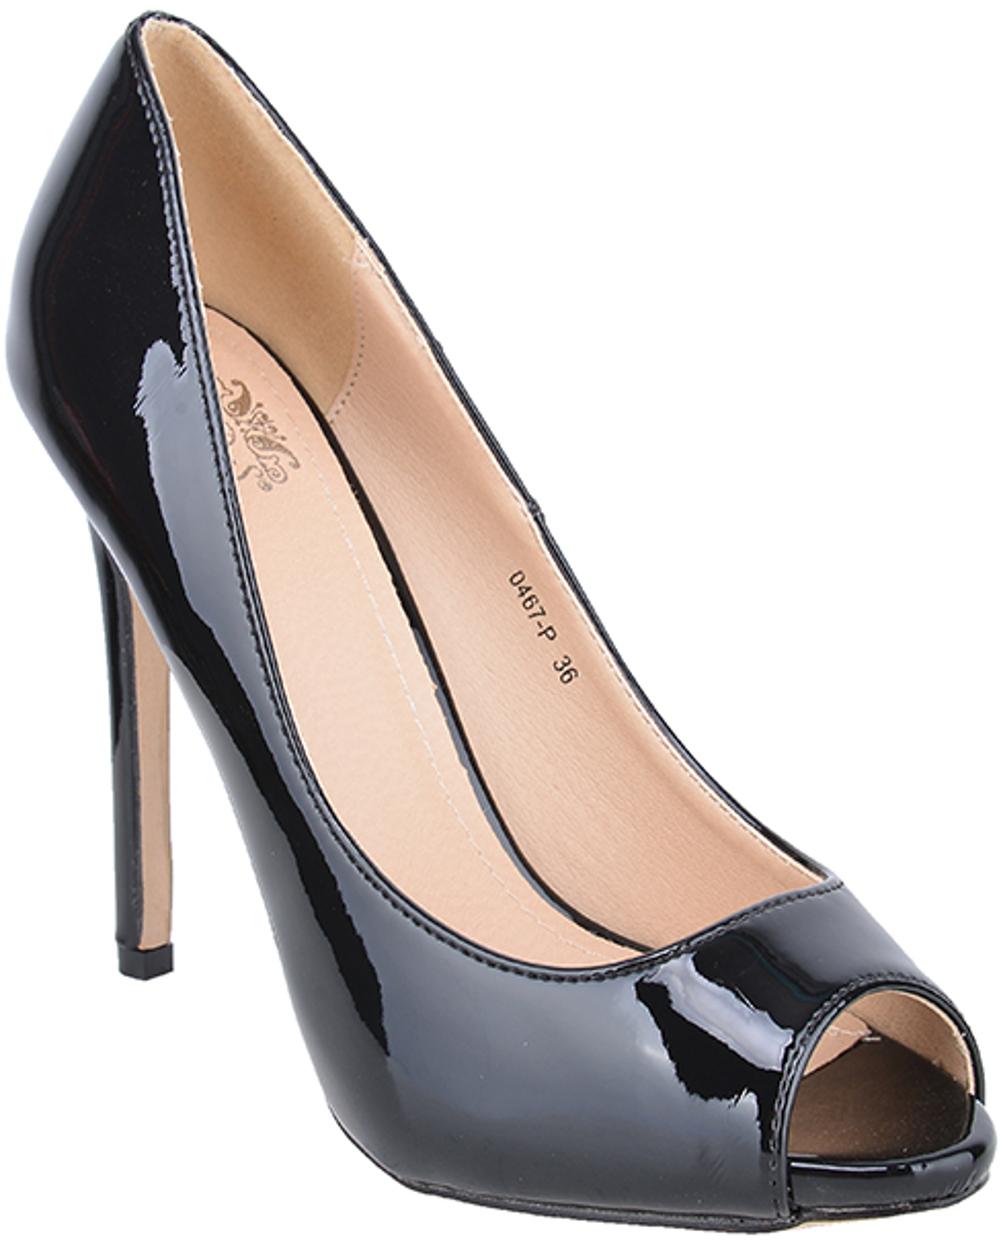 edle pin up lack basic retro peep toes high heels black rockabilly s 0467 p ebay. Black Bedroom Furniture Sets. Home Design Ideas